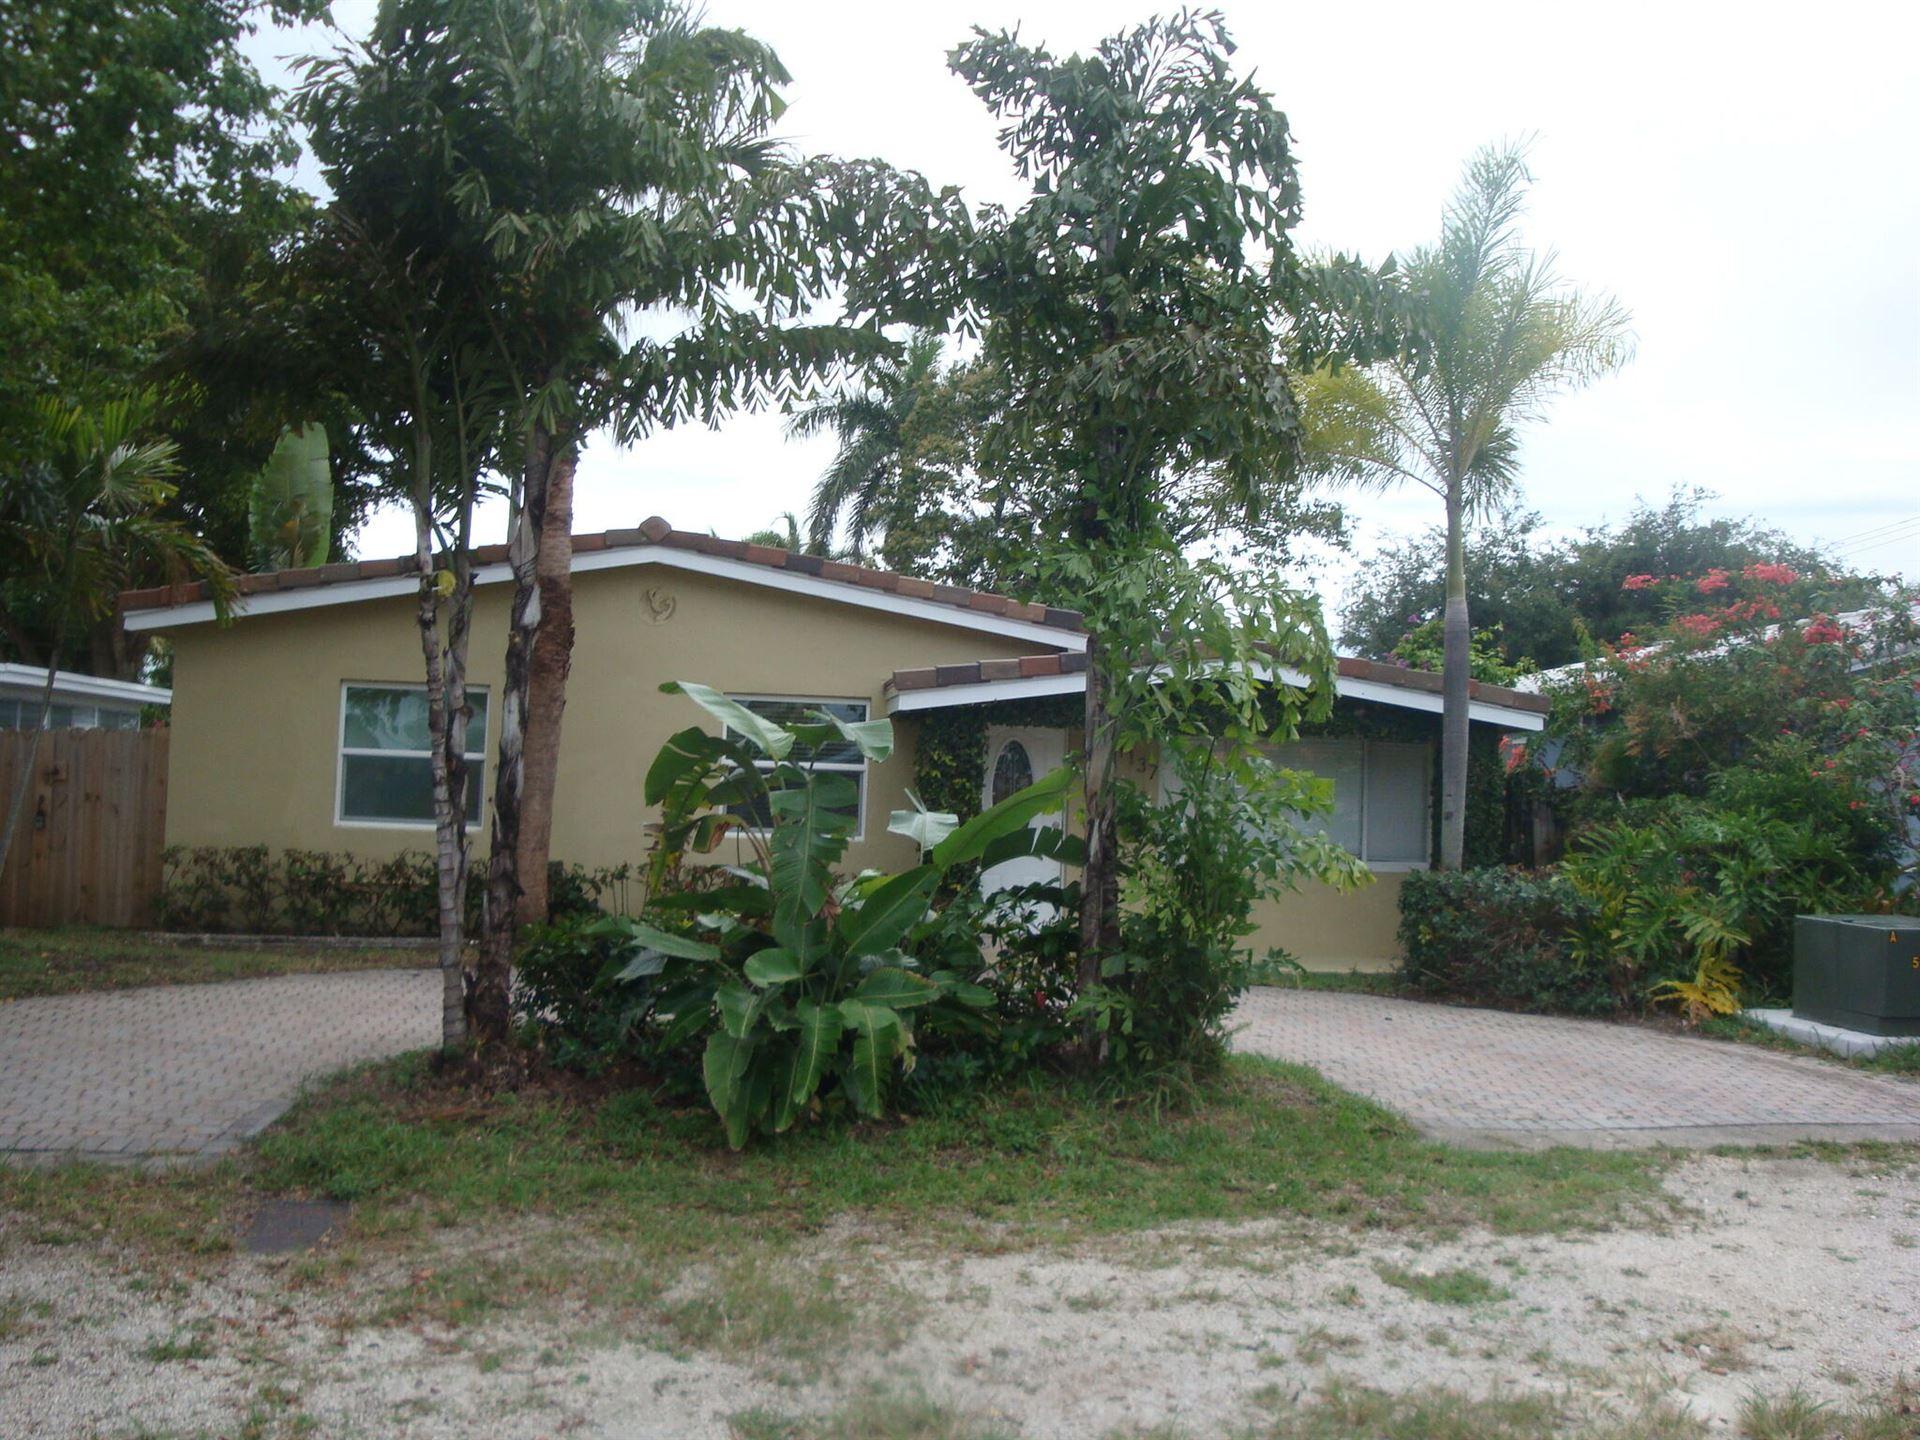 Photo of 1137 NE 17th Terrace, Fort Lauderdale, FL 33304 (MLS # RX-10726559)